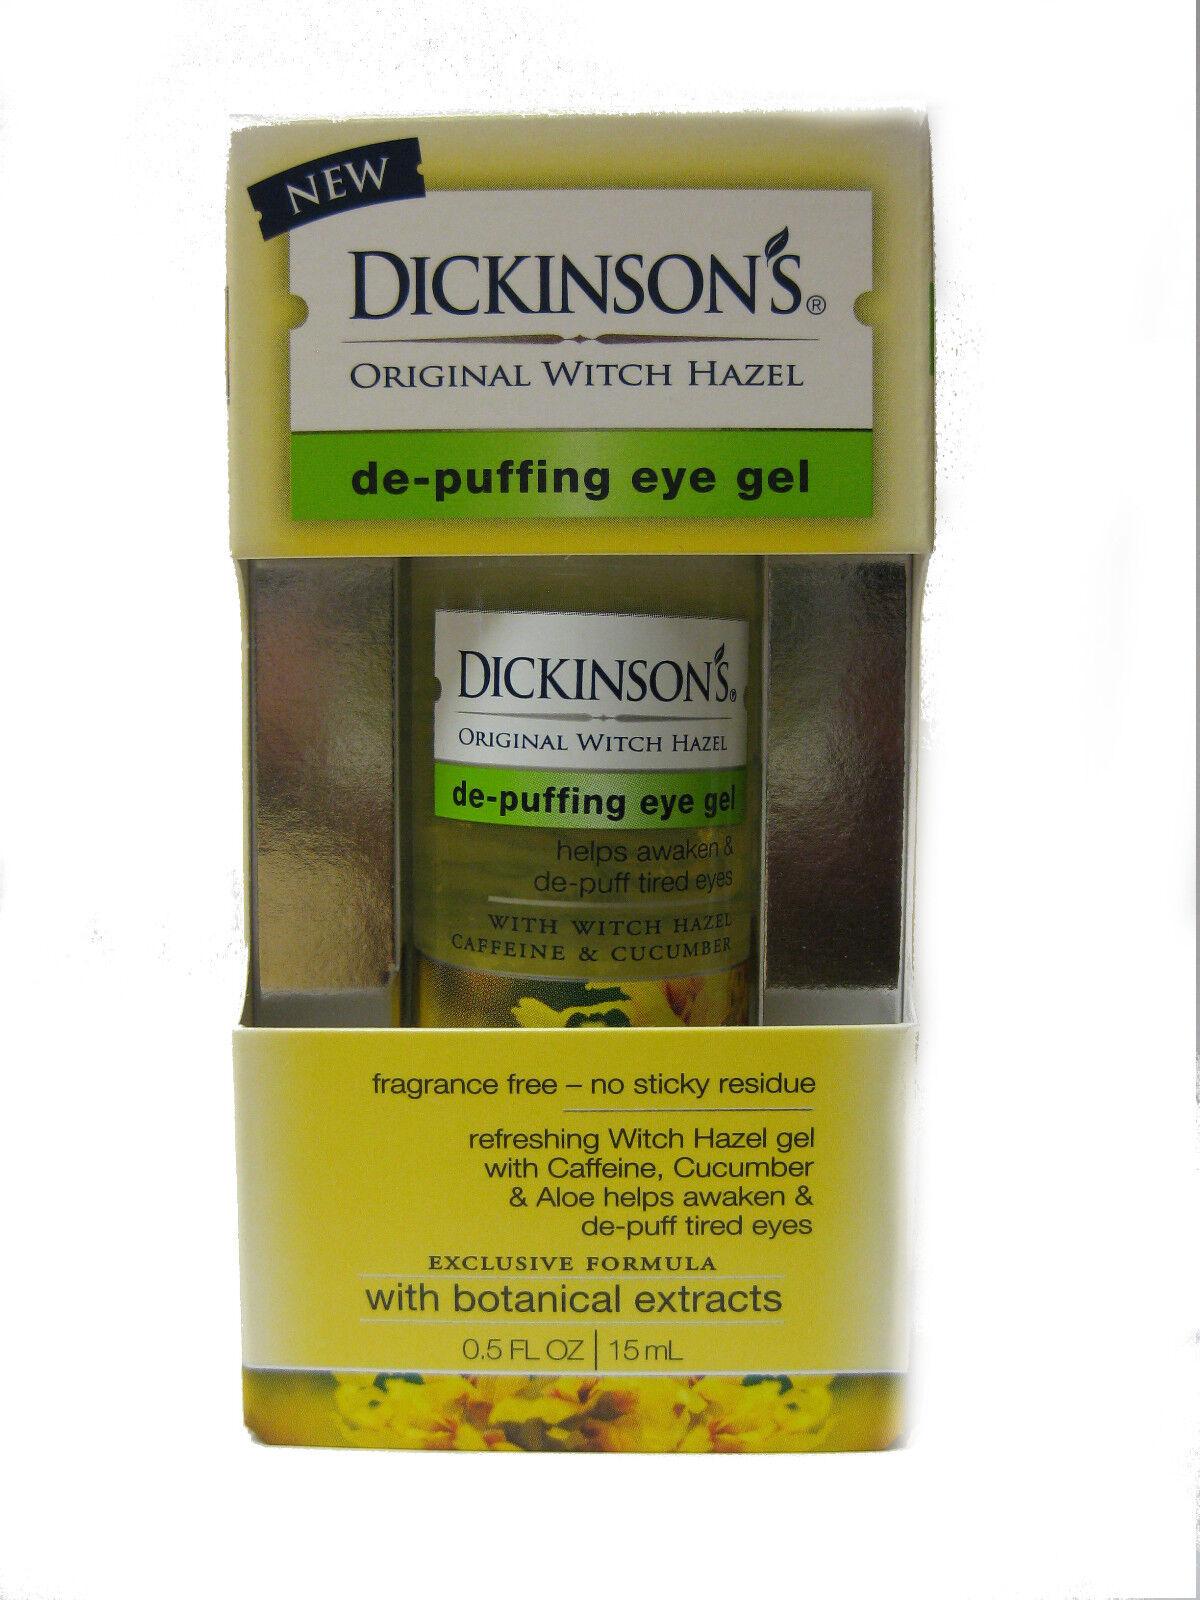 Dickinsons Original Witch Hazel De Puffing Eye Gel 0.5 Oz LO